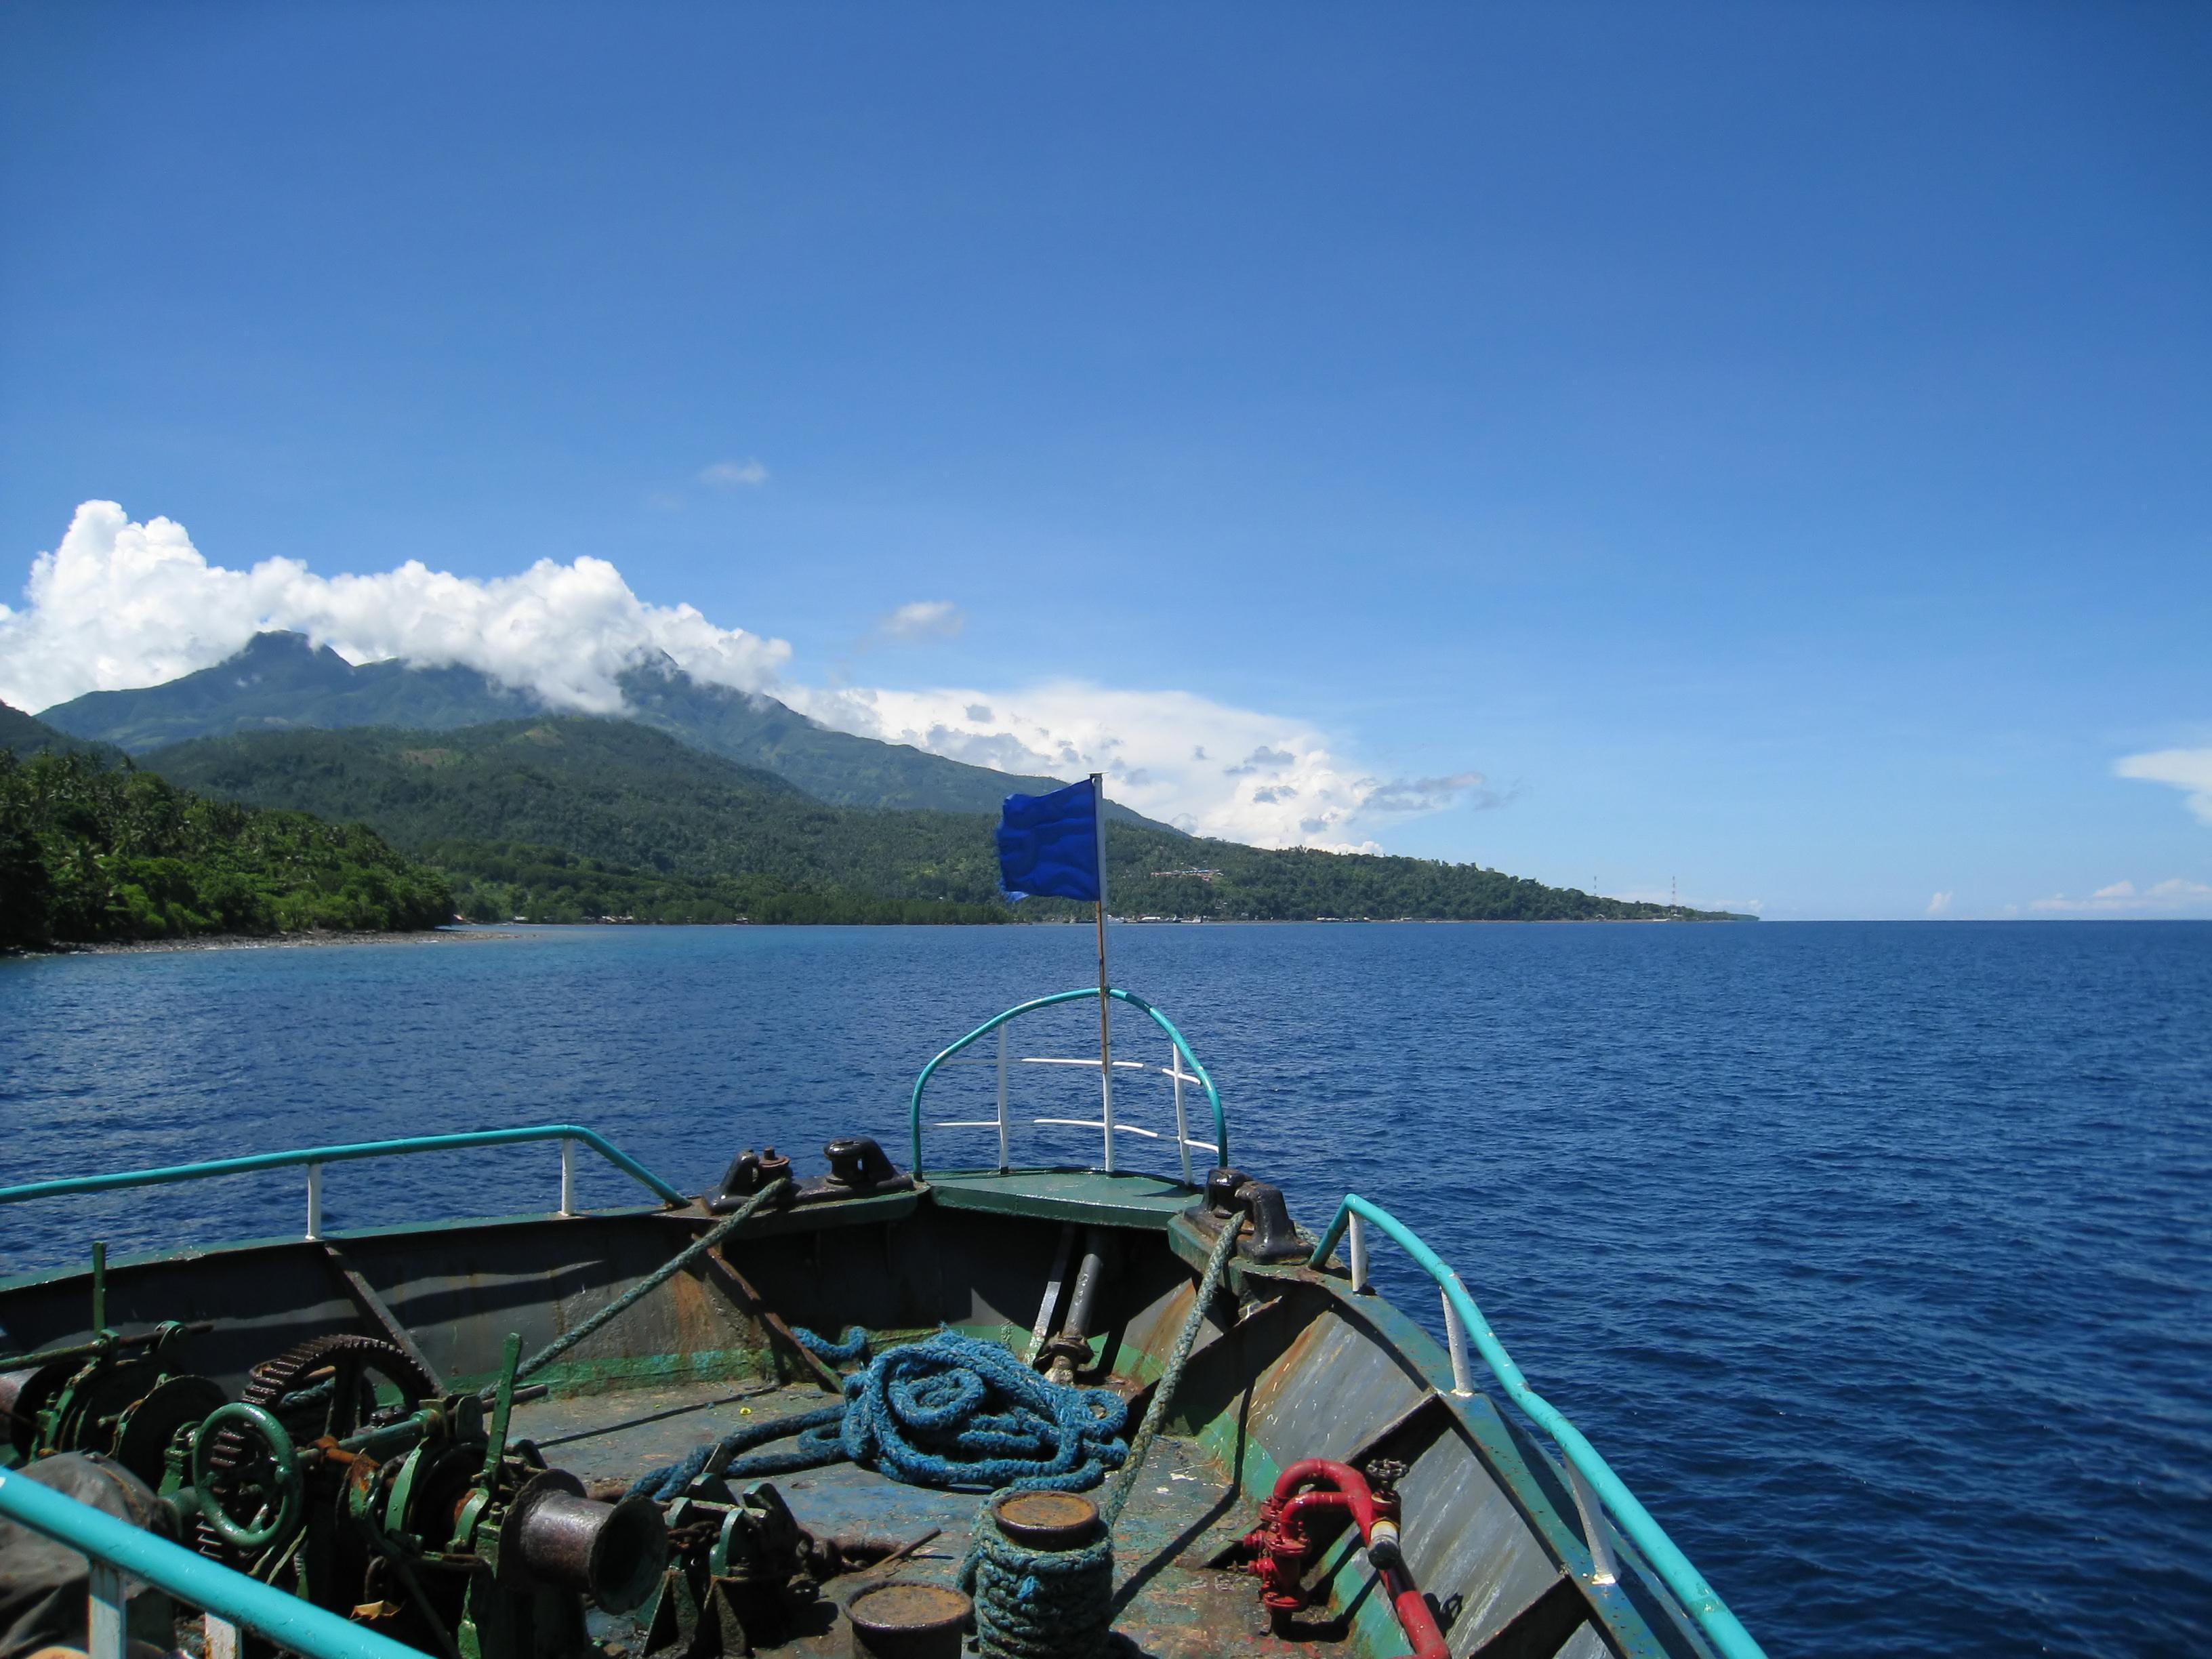 Philippines Camiguin Camiguin Island Ferry 01